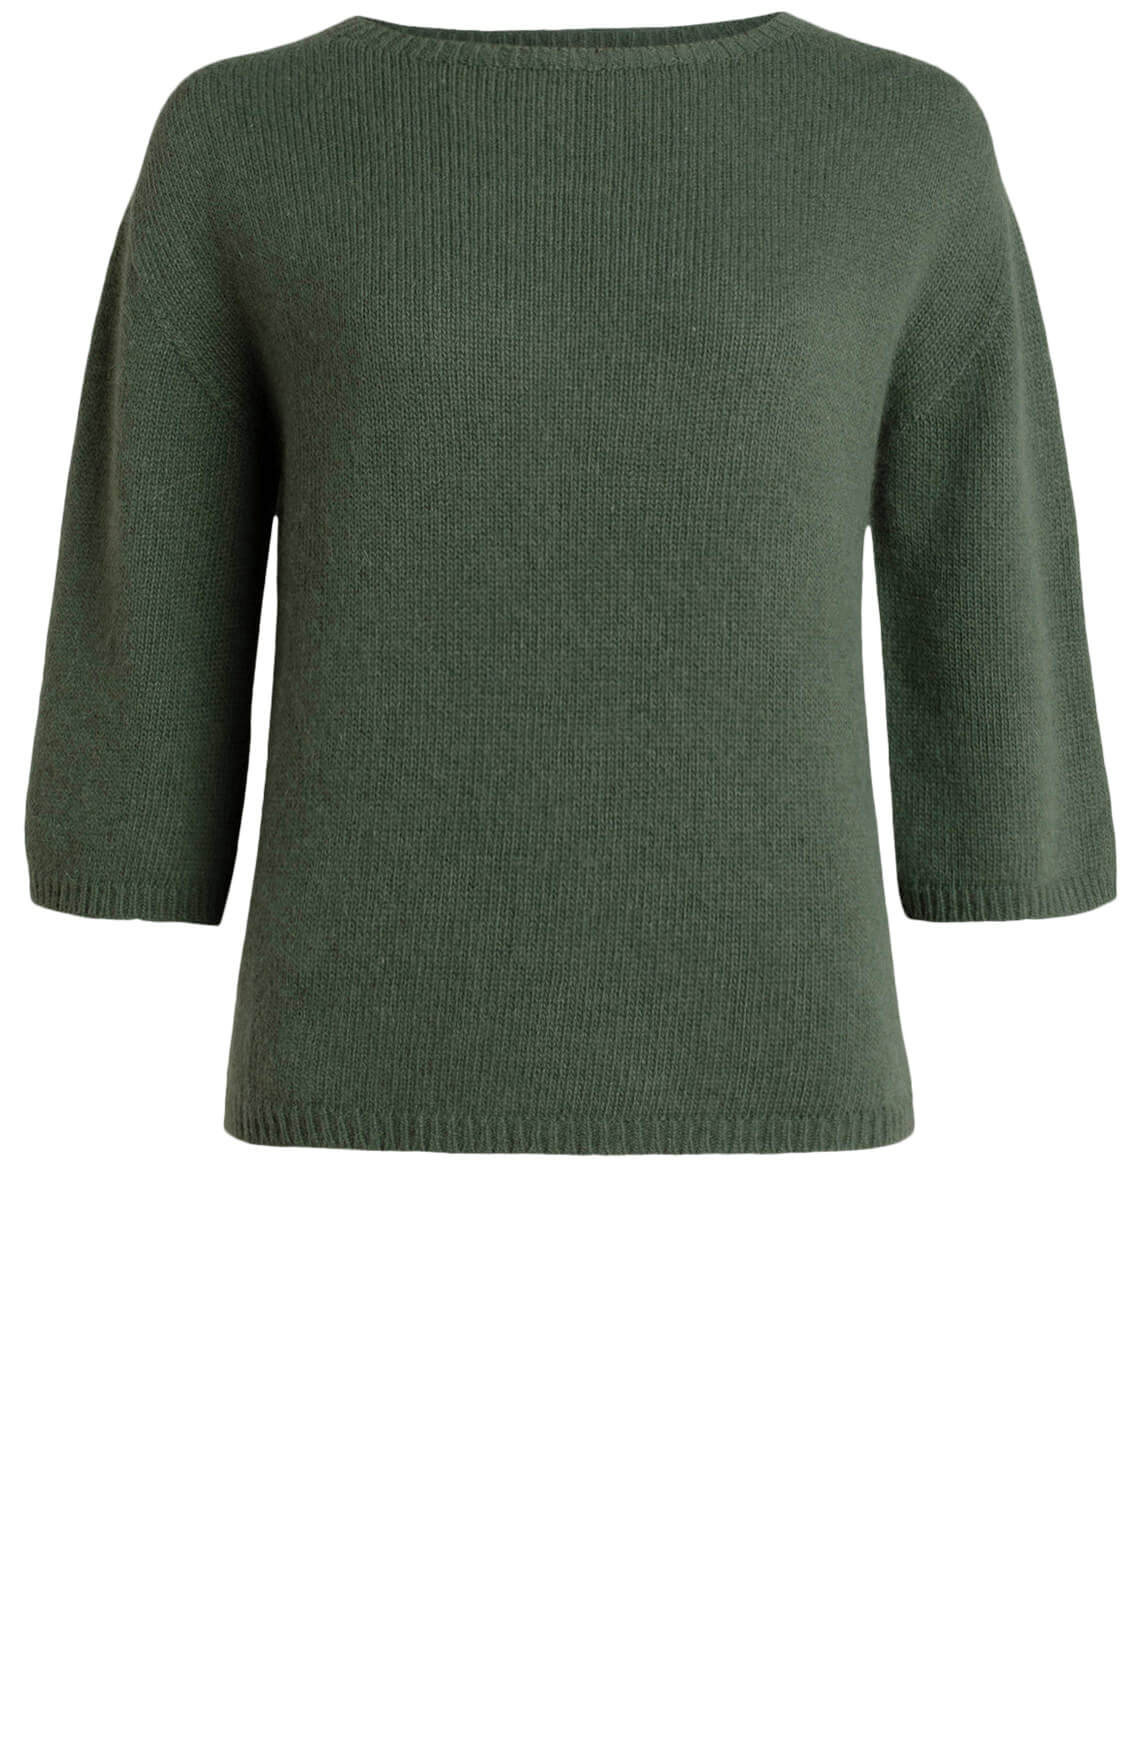 La Fée Maraboutée Dames Gebreide pullover groen